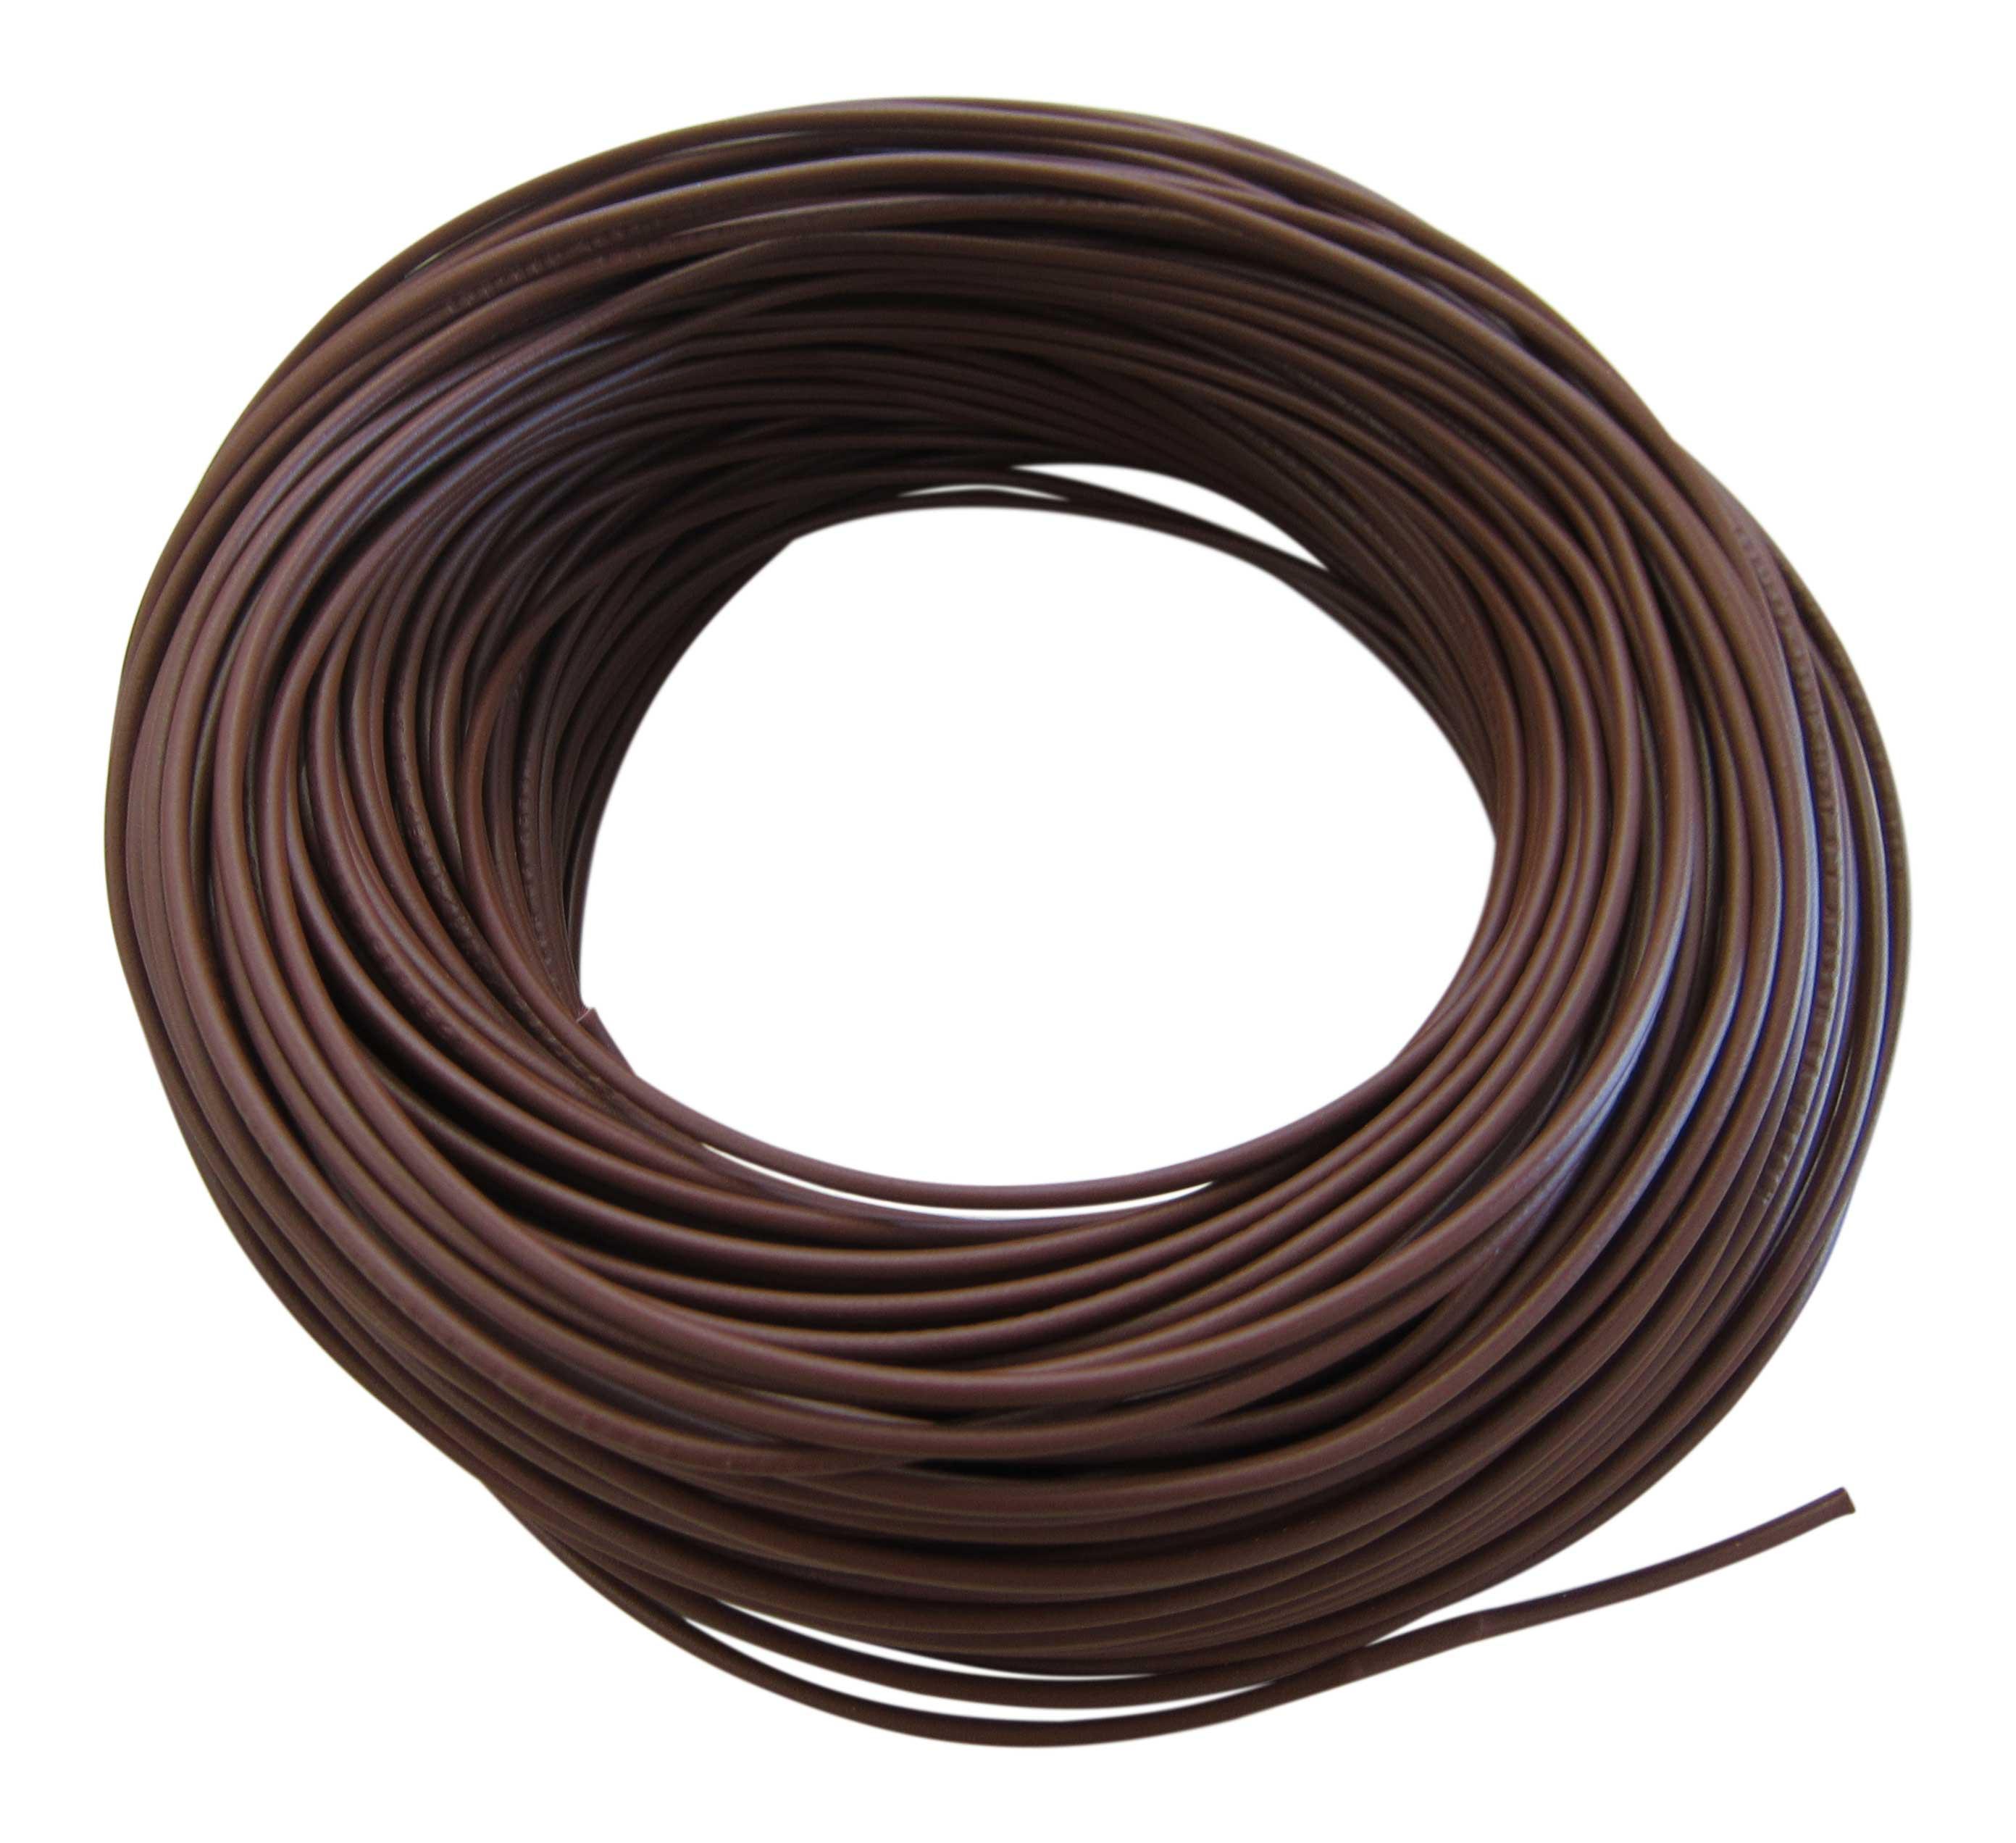 0,31€/m KFZ LKW Kabel Litze Leitung Flexible FLRy 0,75mm² 20m Braun M. i Germany